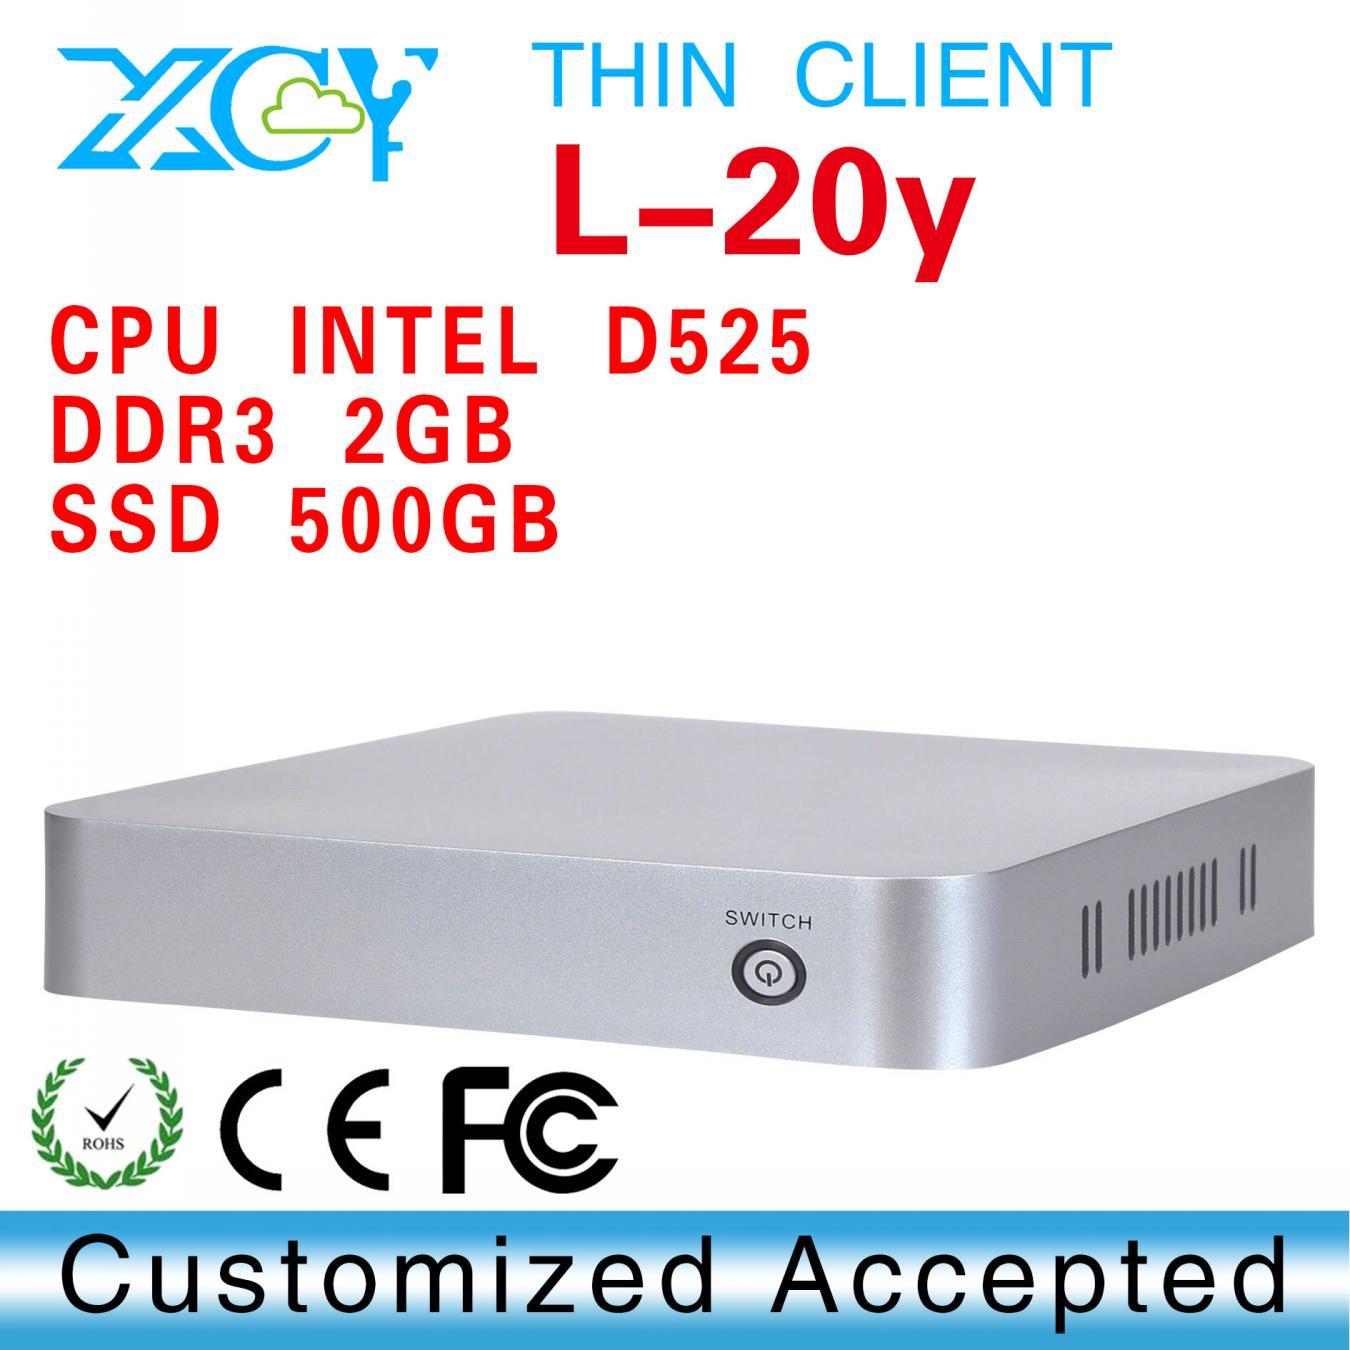 XCY L-20Y mini pc rs232, ncomputing x300 box pc, thin client computer no noise, less heat(China (Mainland))